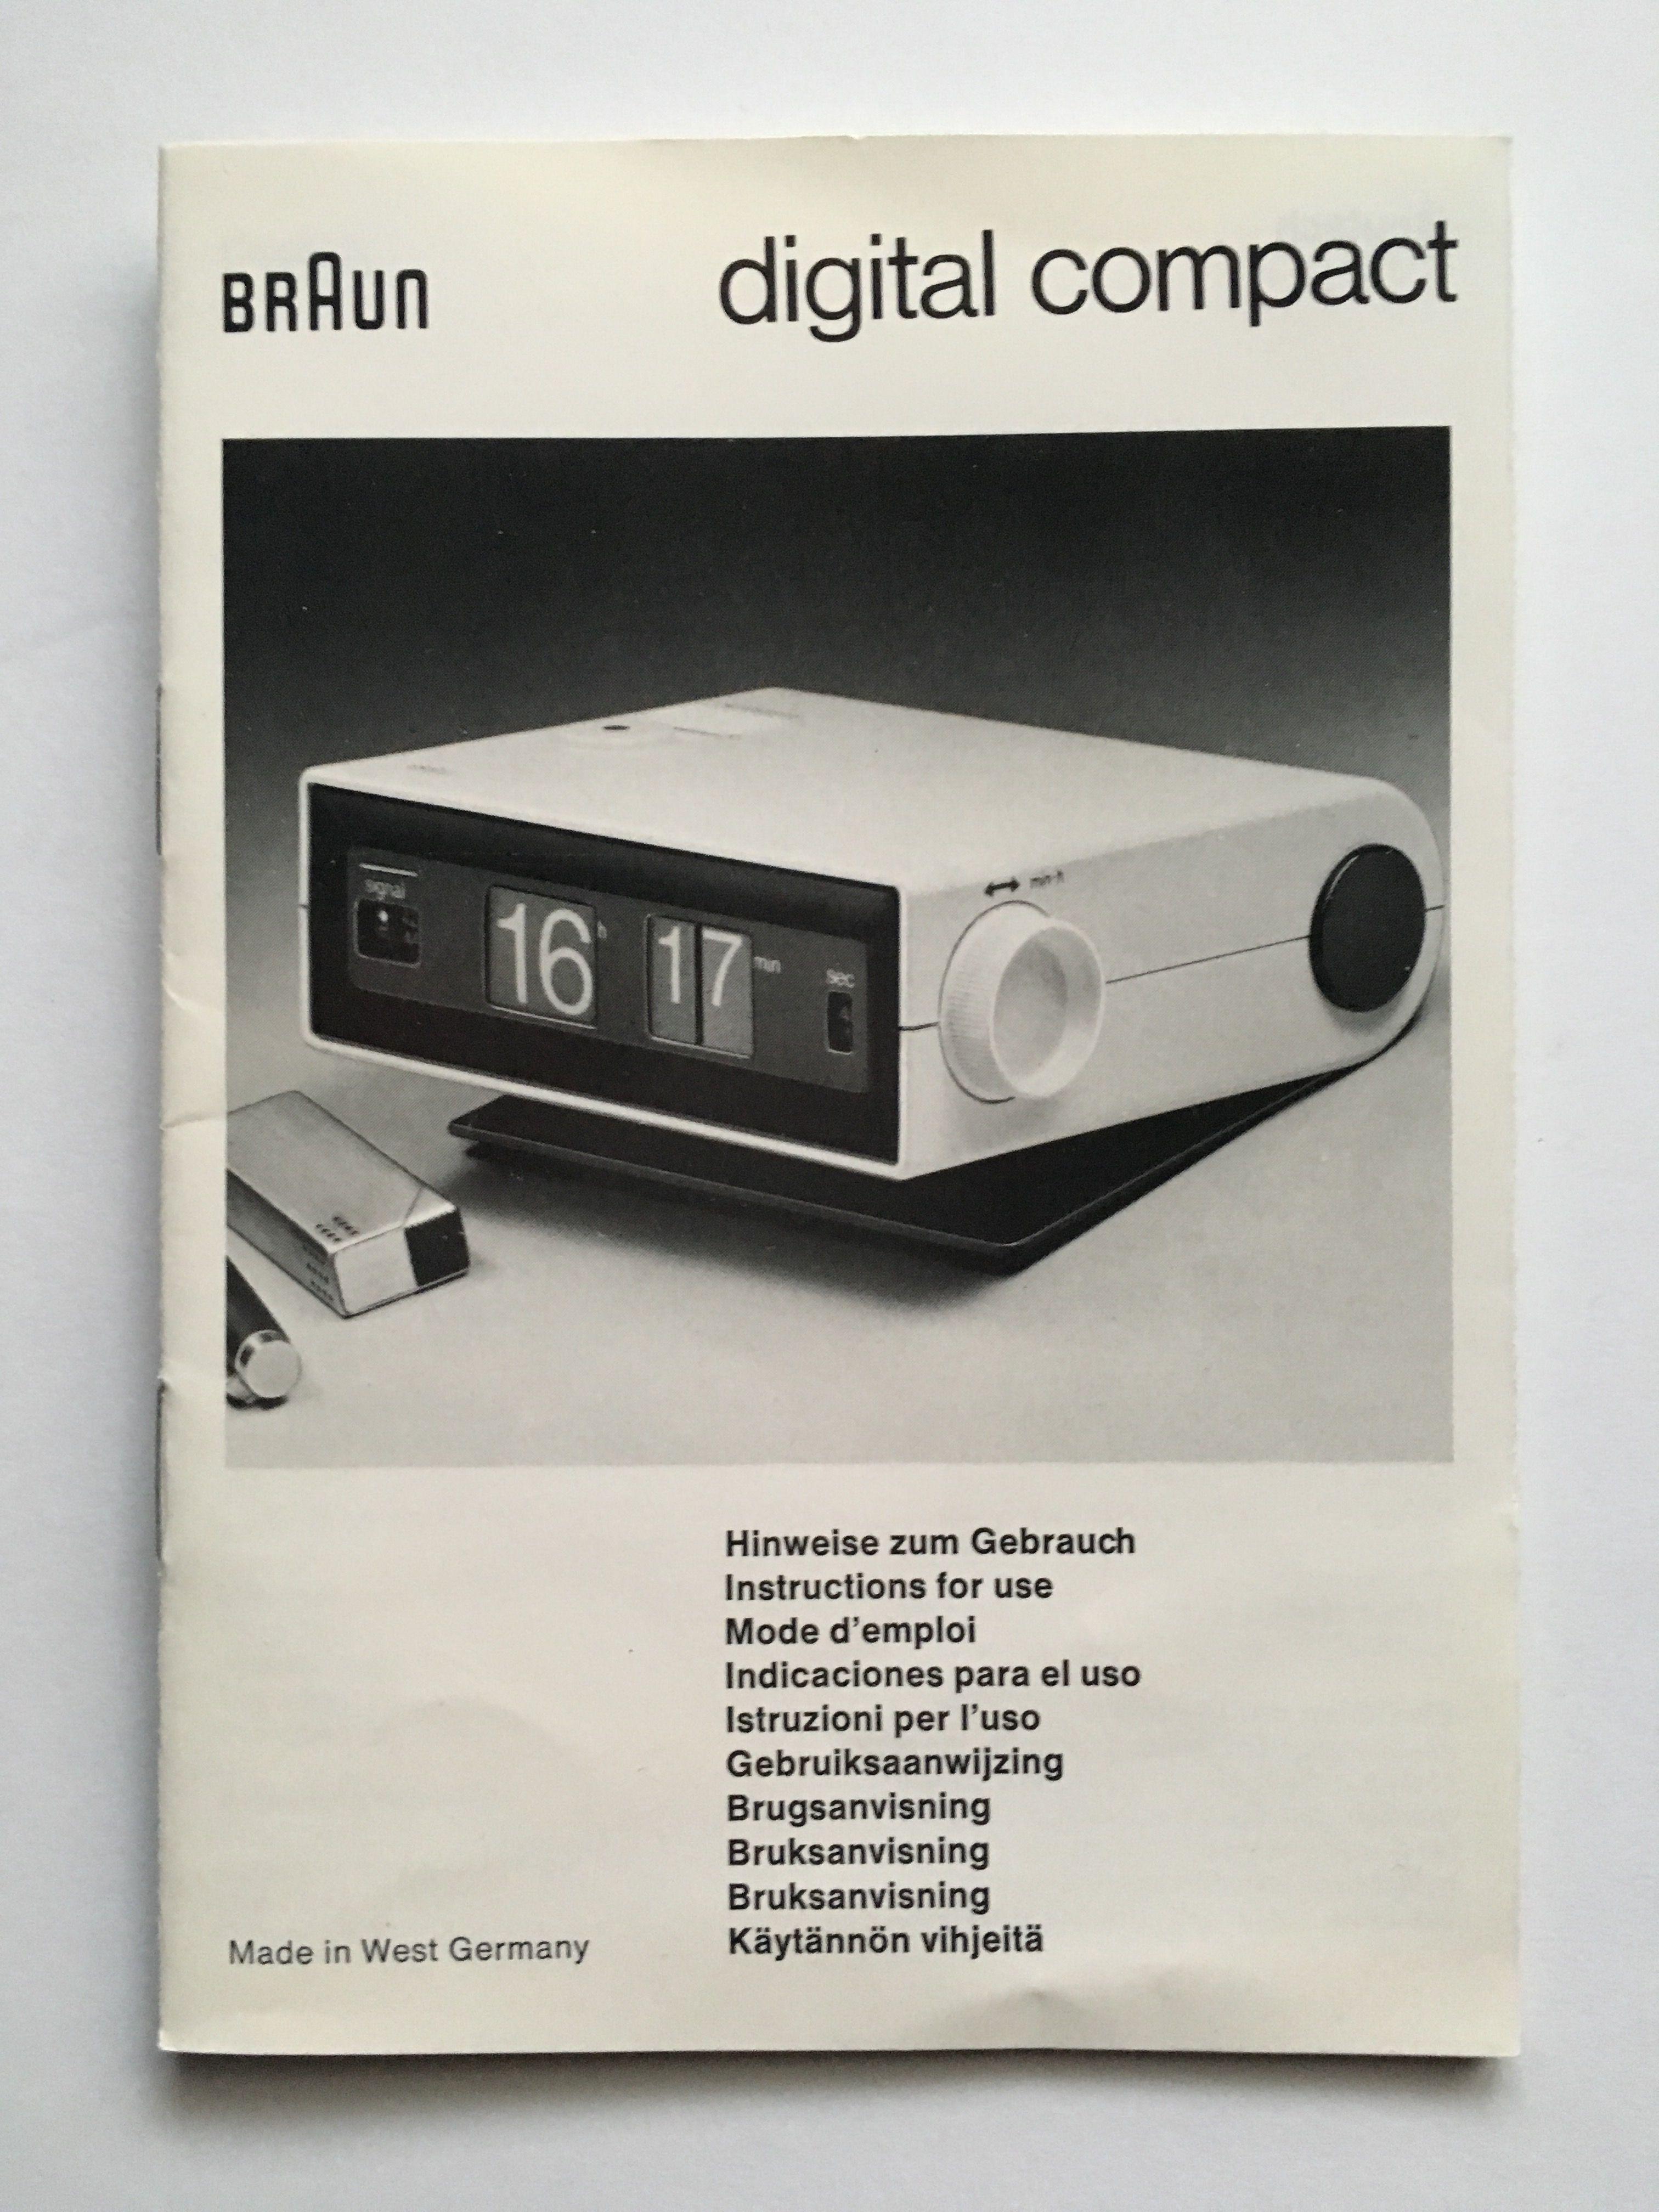 Braun digital compact manual | typ 4937 rollzahlenwecker ...